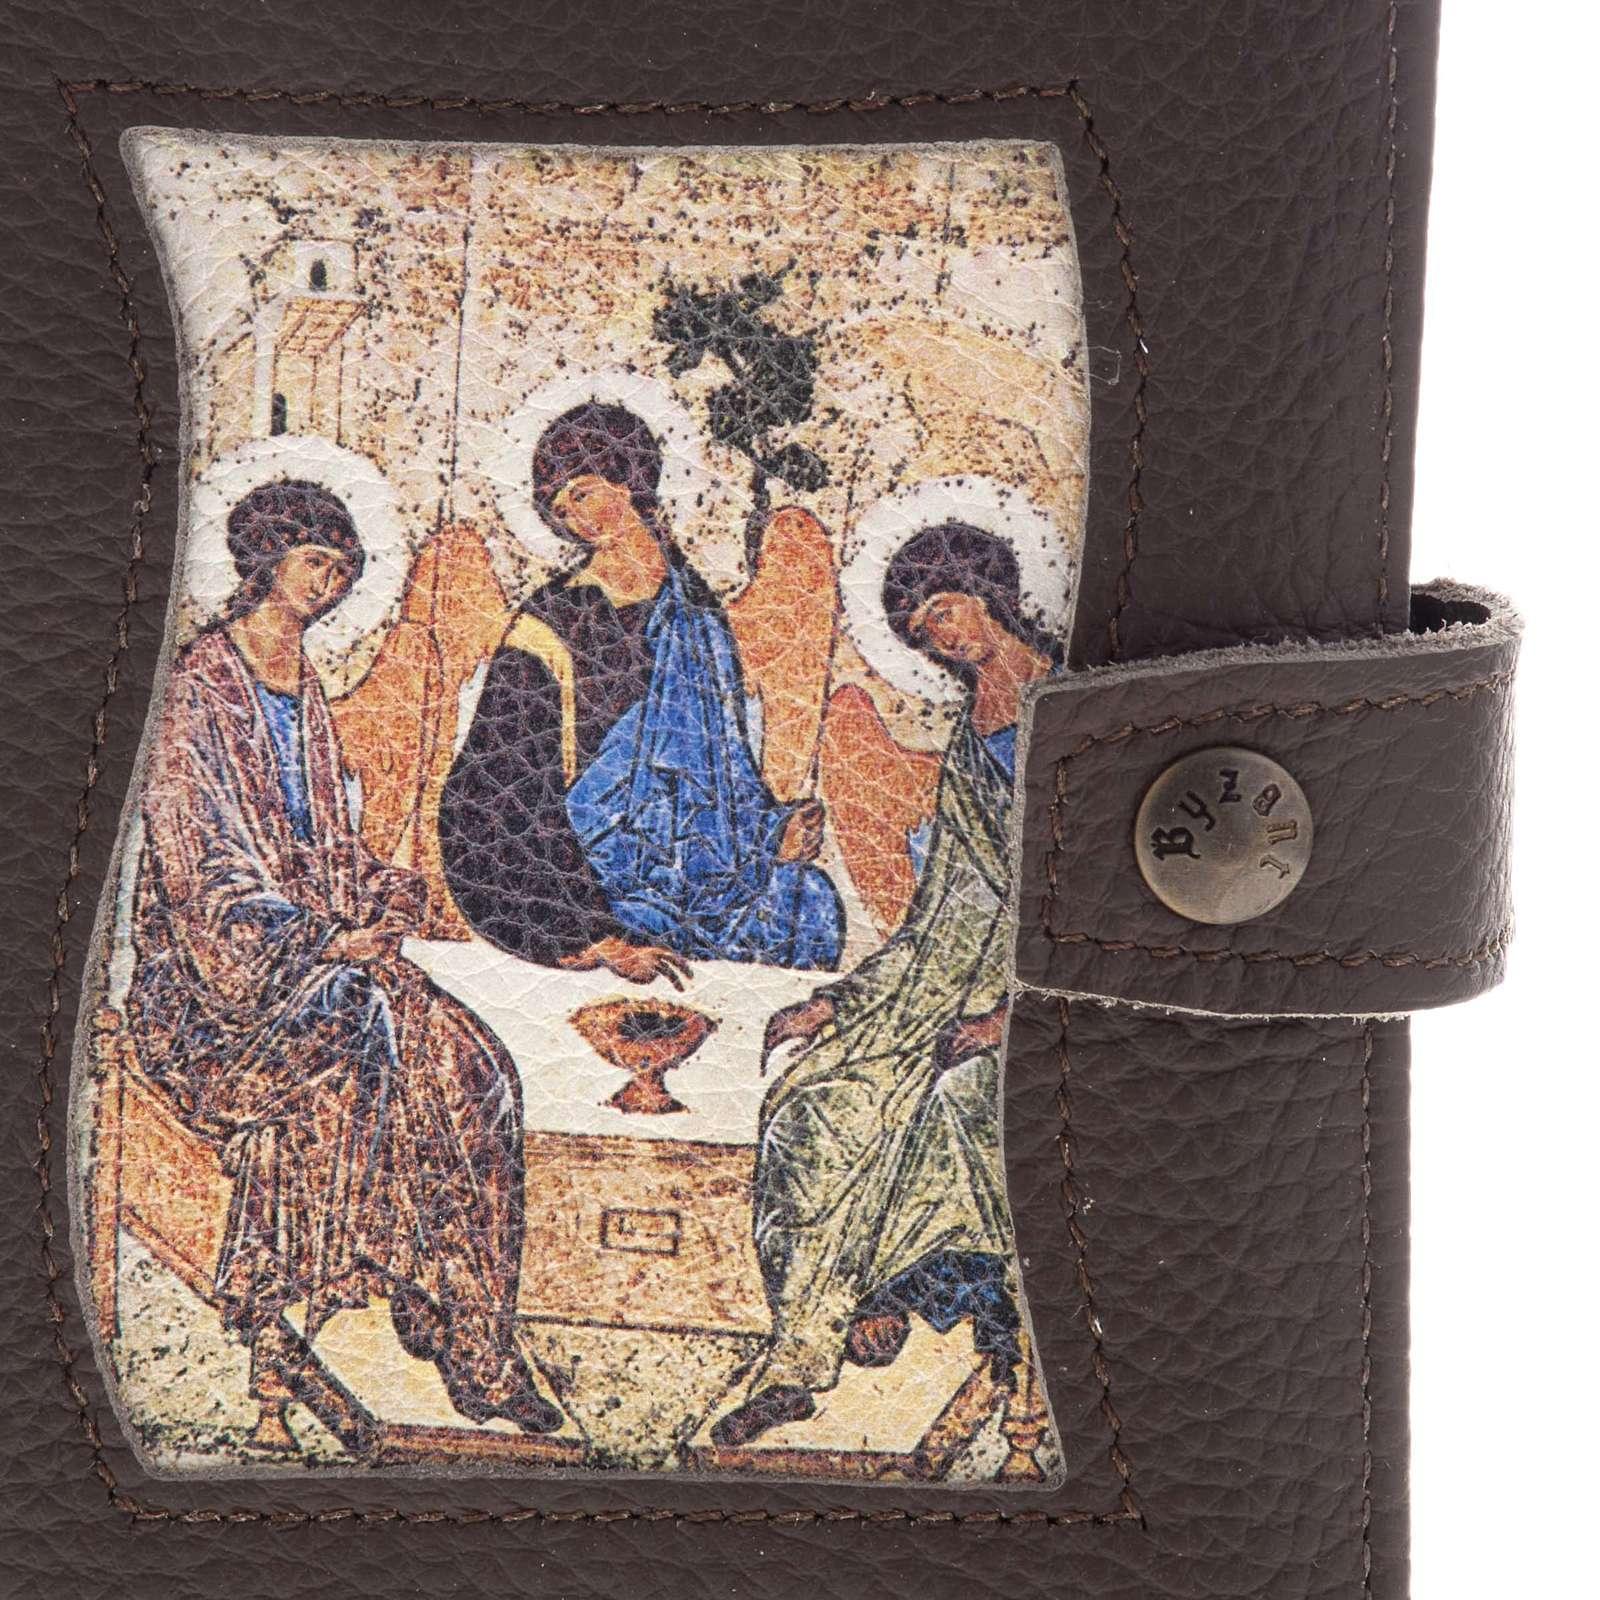 Copertine liturgia vol. unico pelle SS.Trinità 4